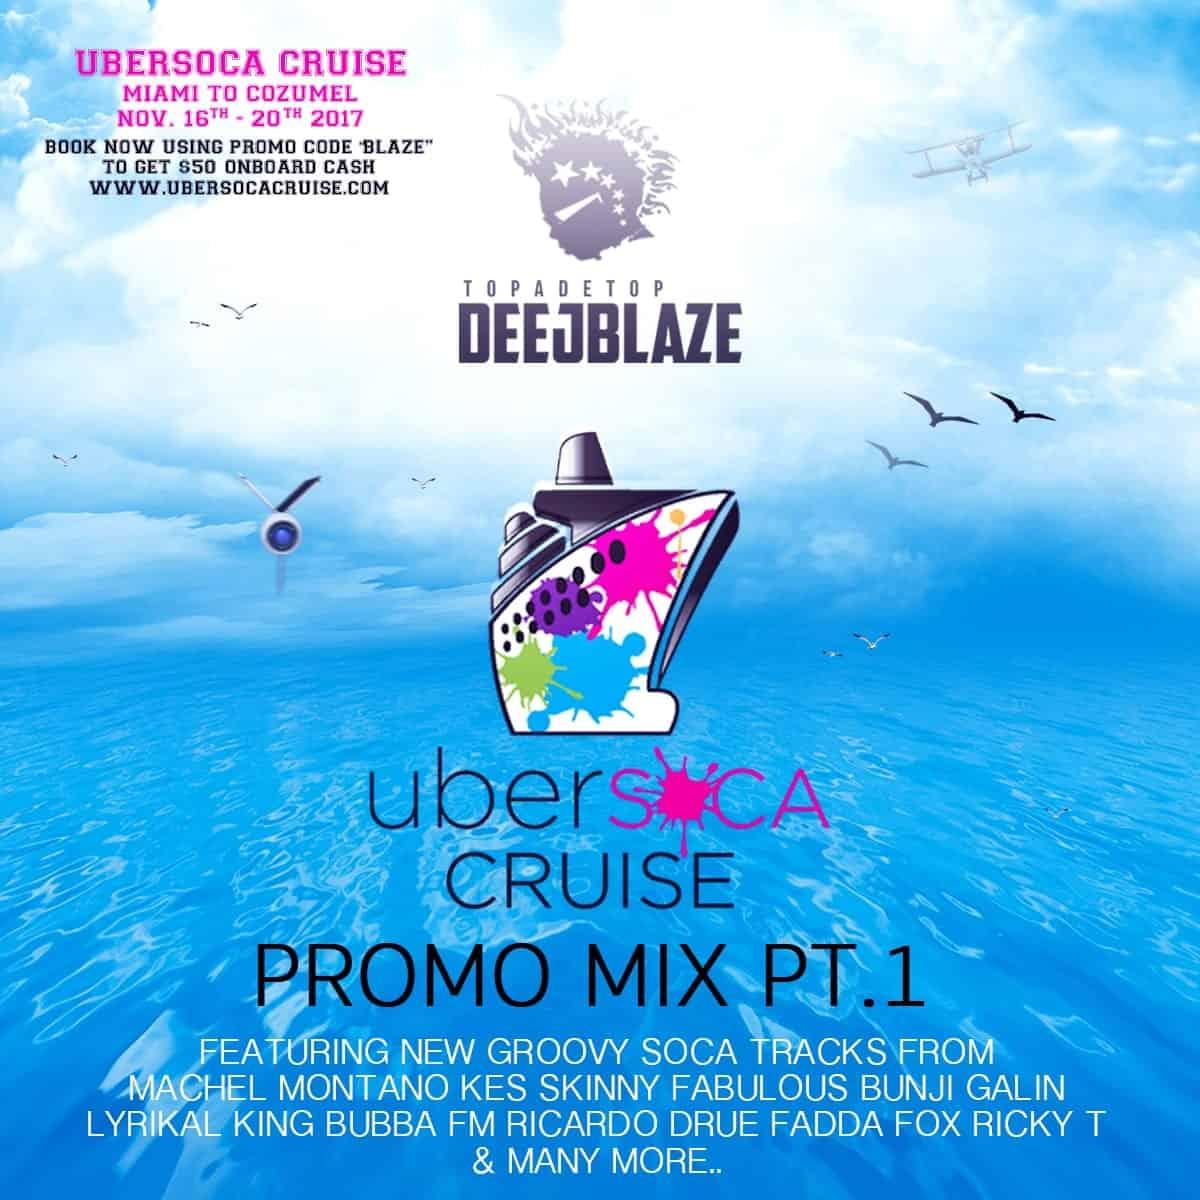 DeejBlaze UberSoca Cruise 2017 Mix - Groovy & Power Mixes